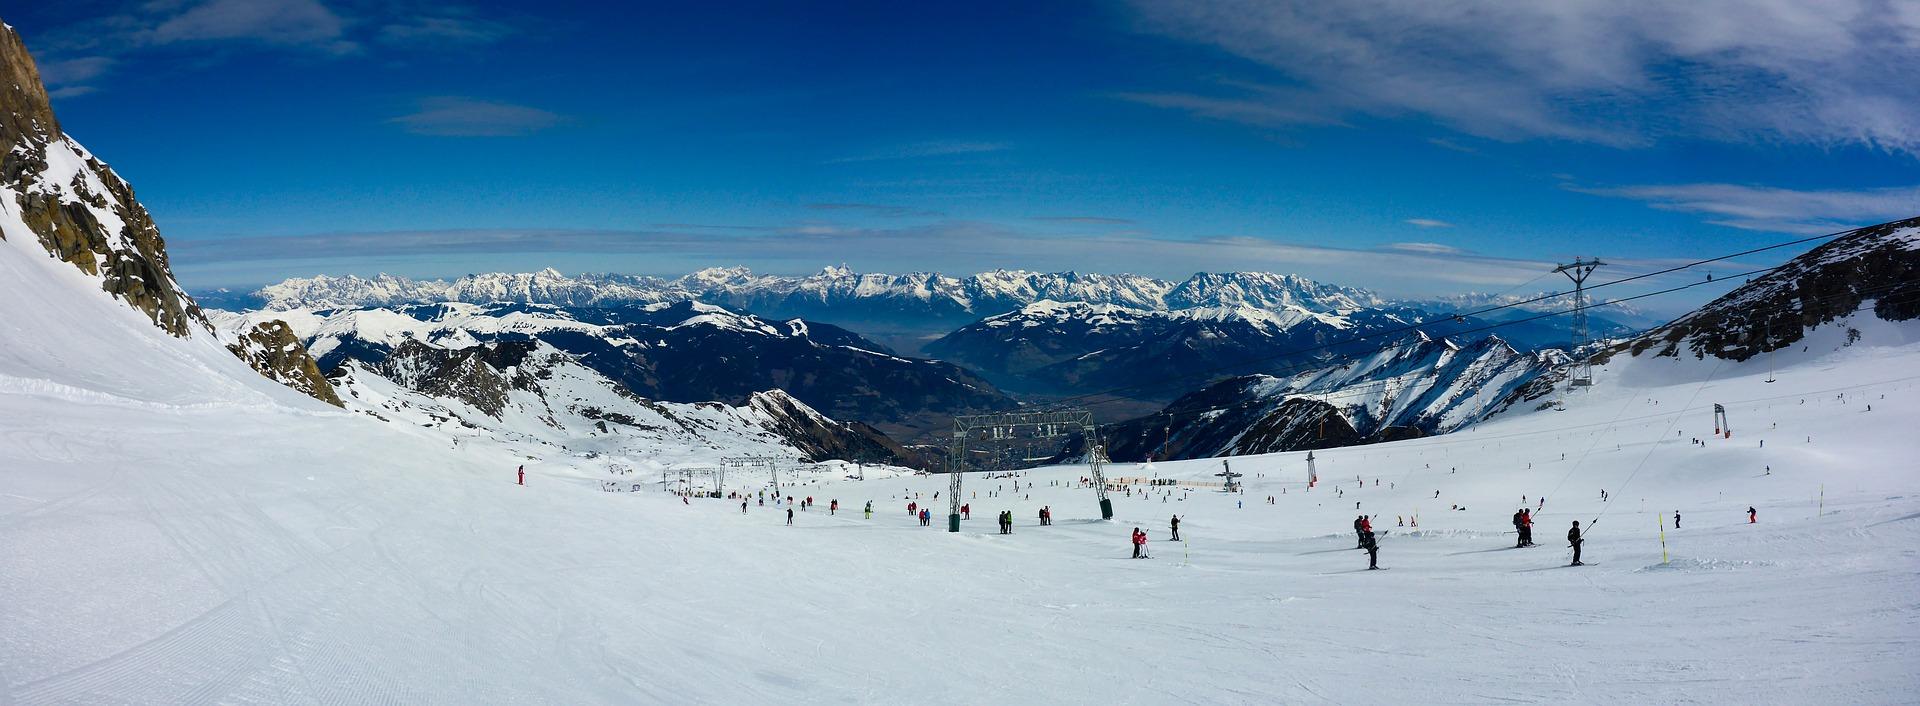 Sports d'hiver: Descente de ski